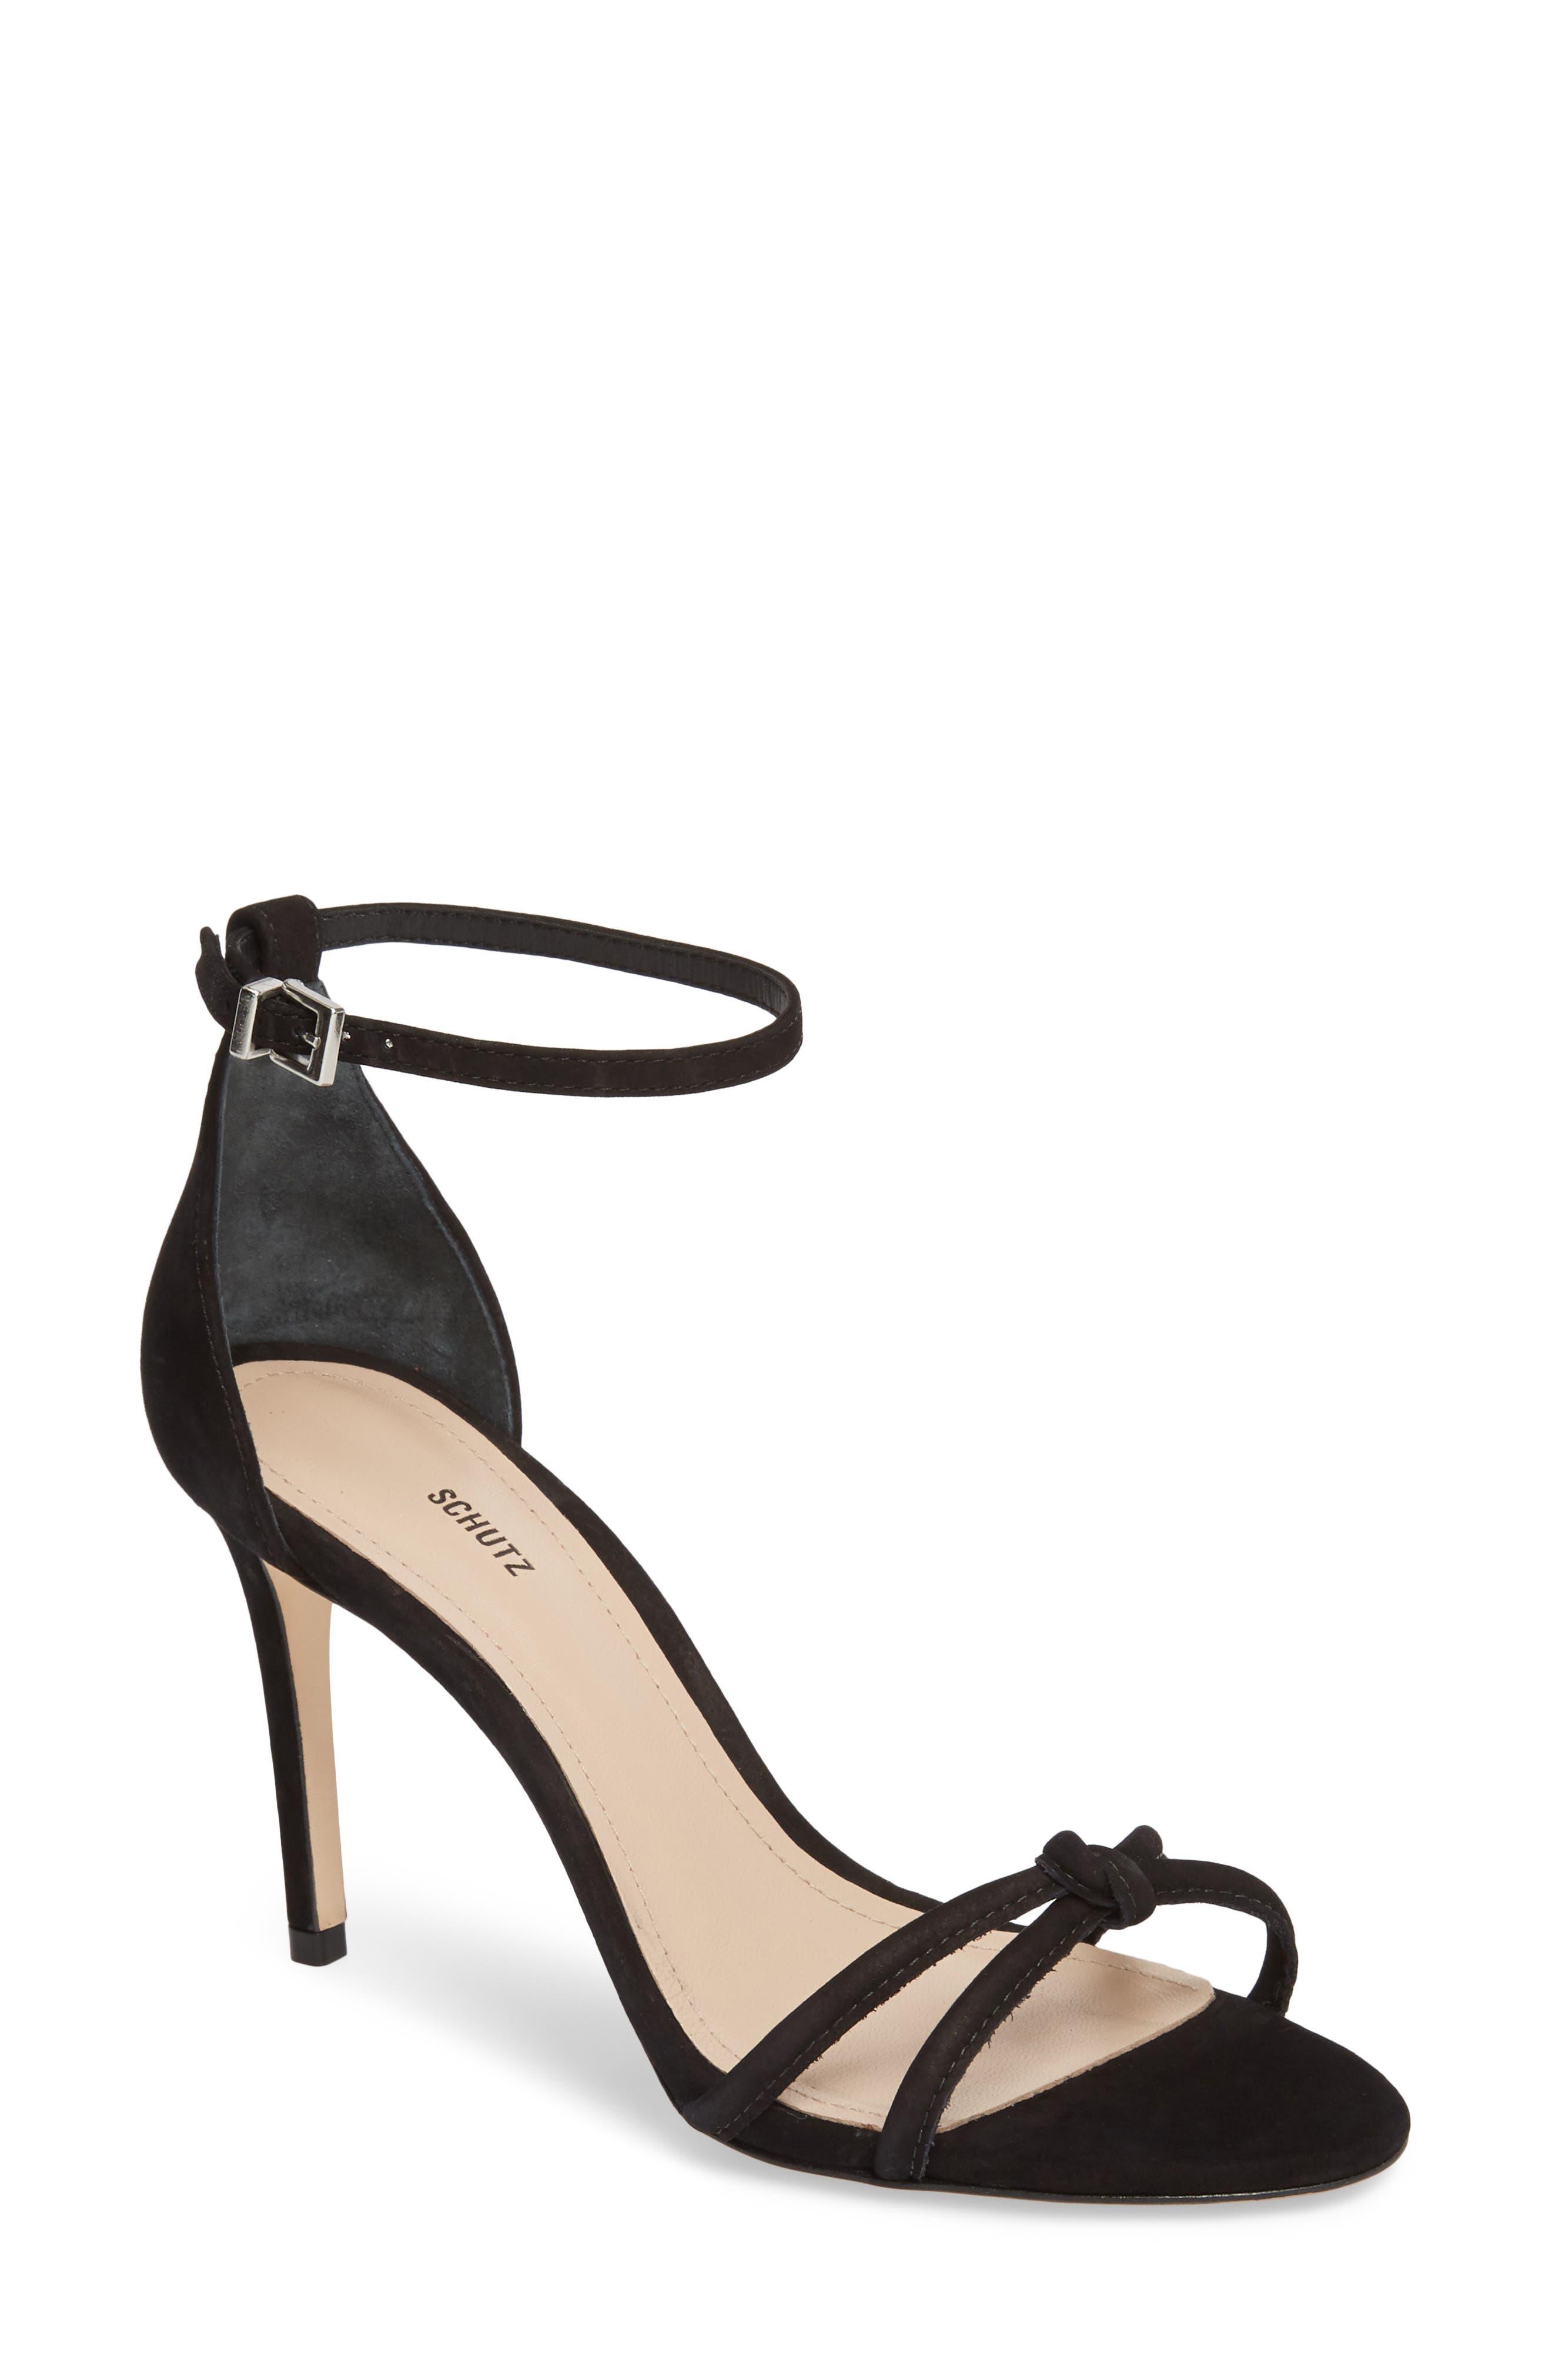 Rhana Ankle Strap Sandal,                             Main thumbnail 1, color,                             Black Leather